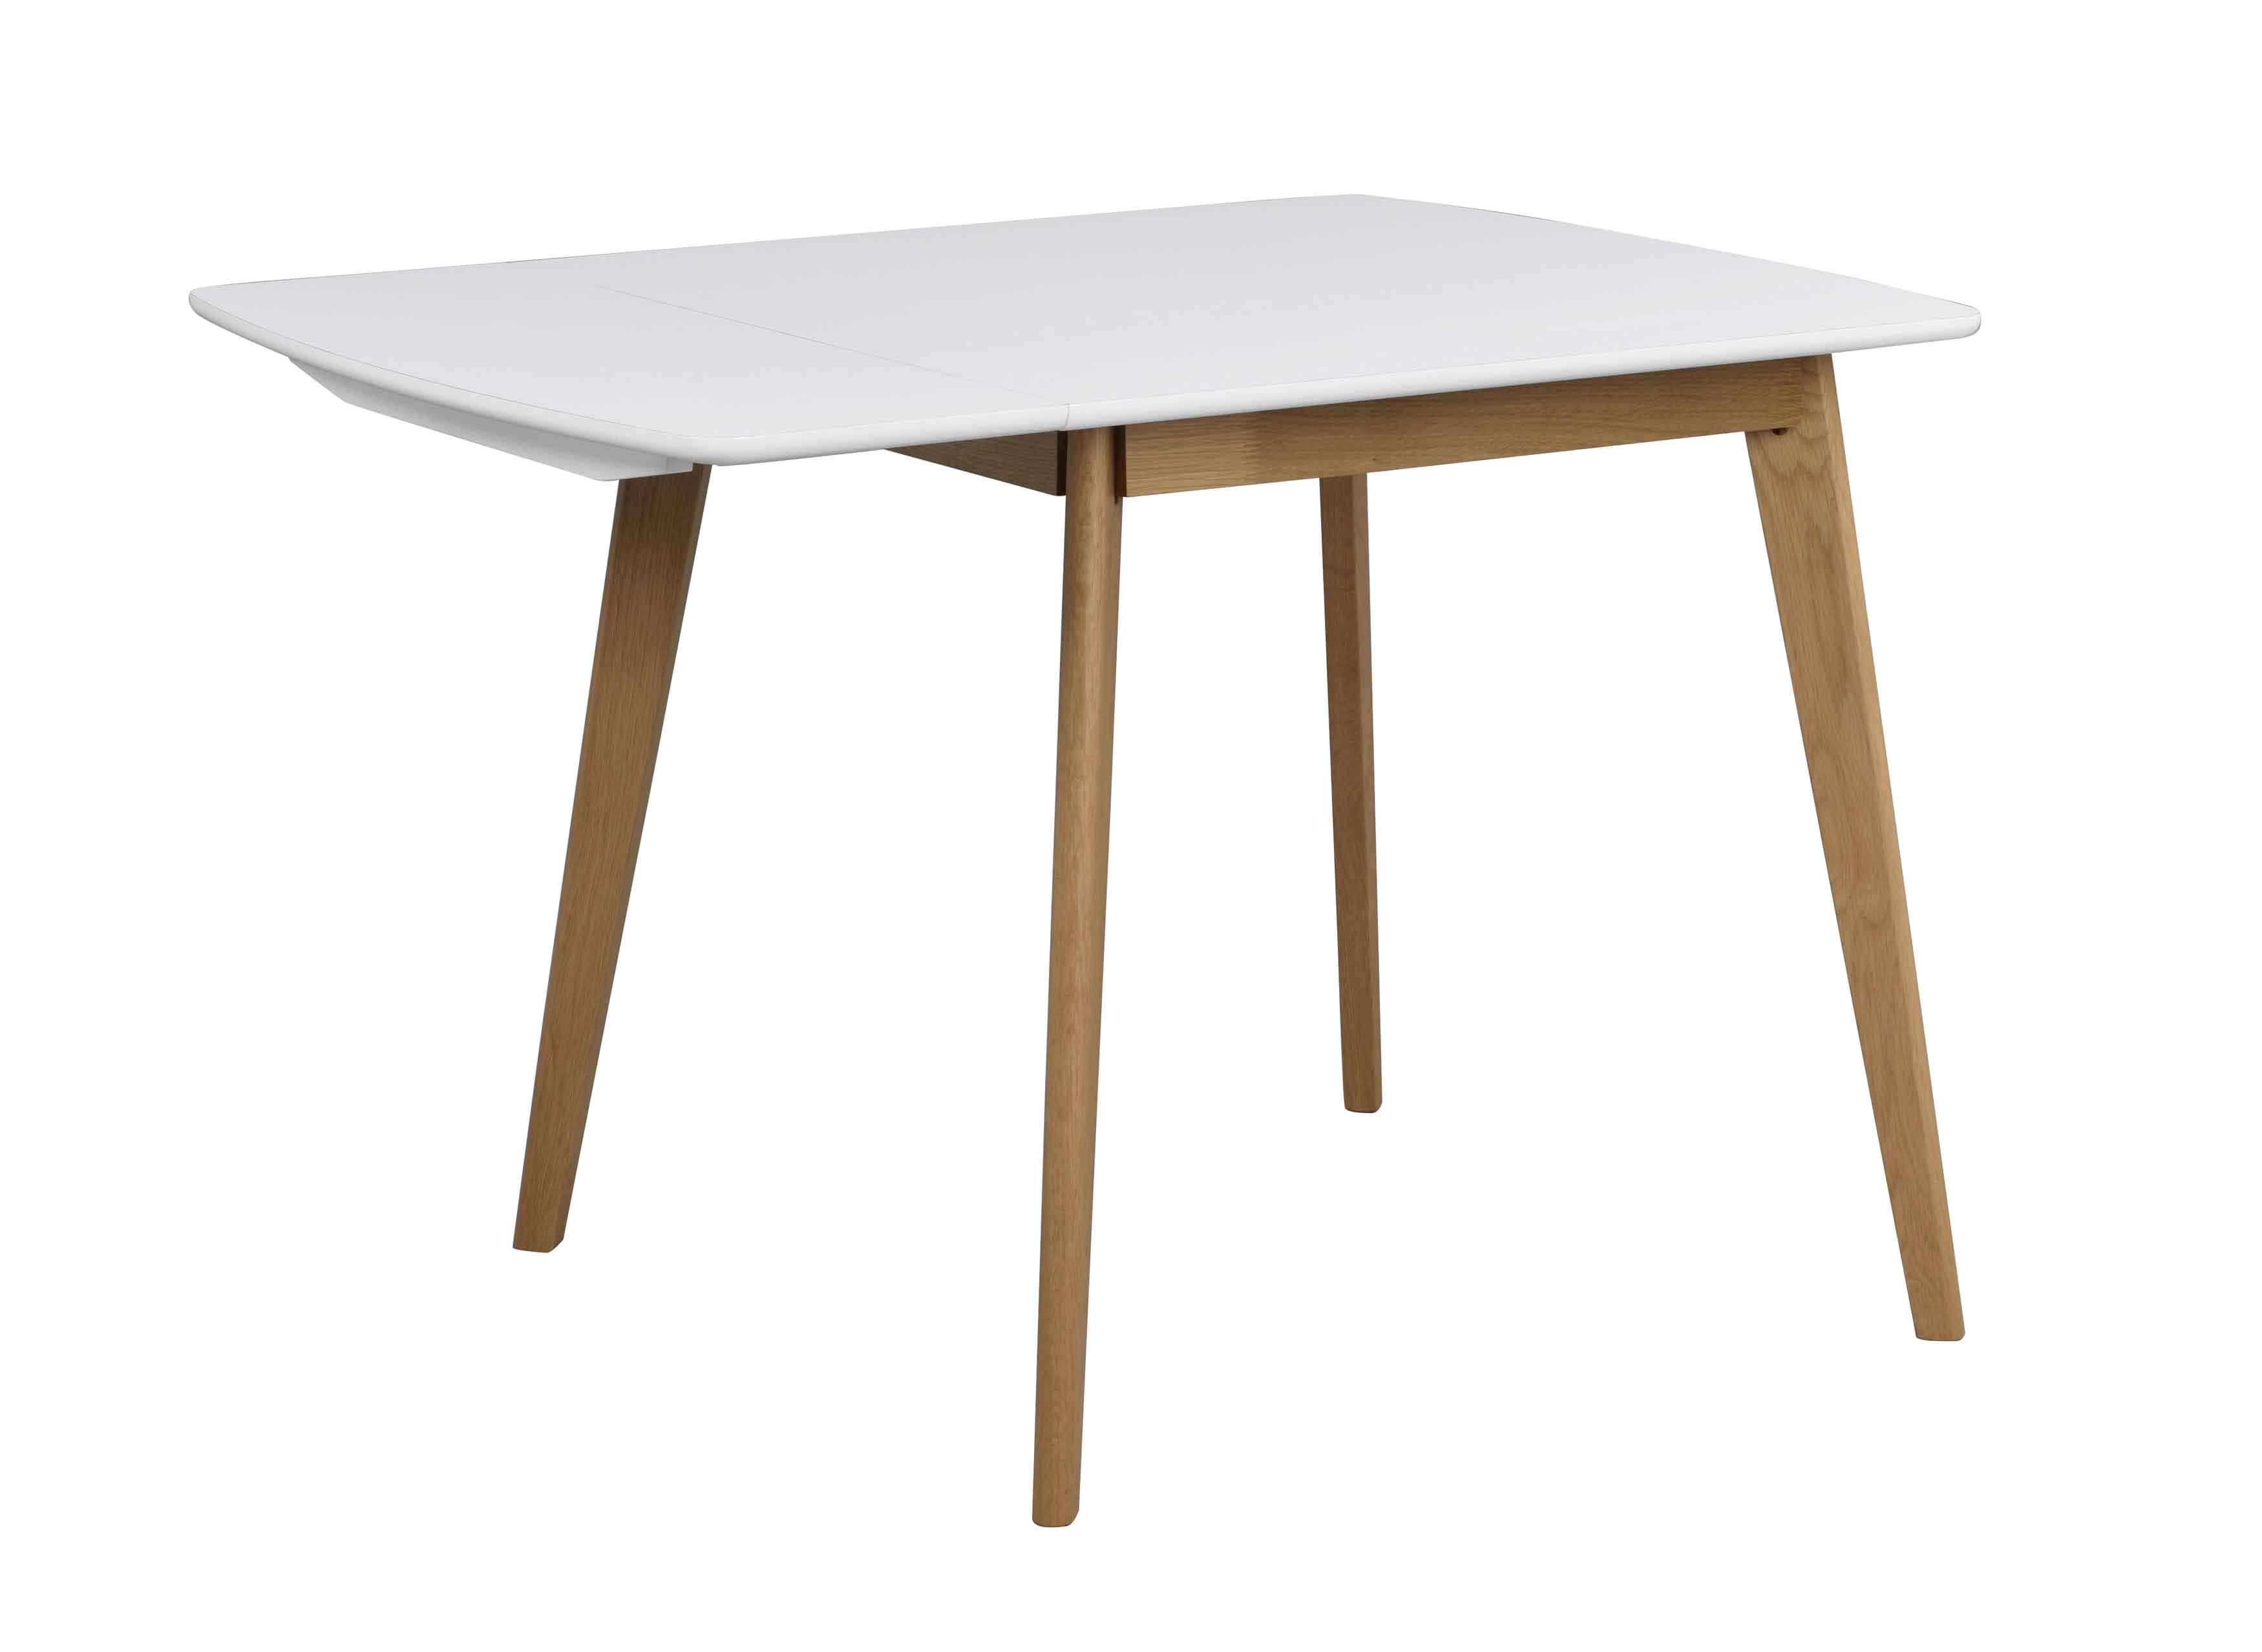 Olivia klapbord - Hvid bordplade, lakeret egetræsben, 80+30